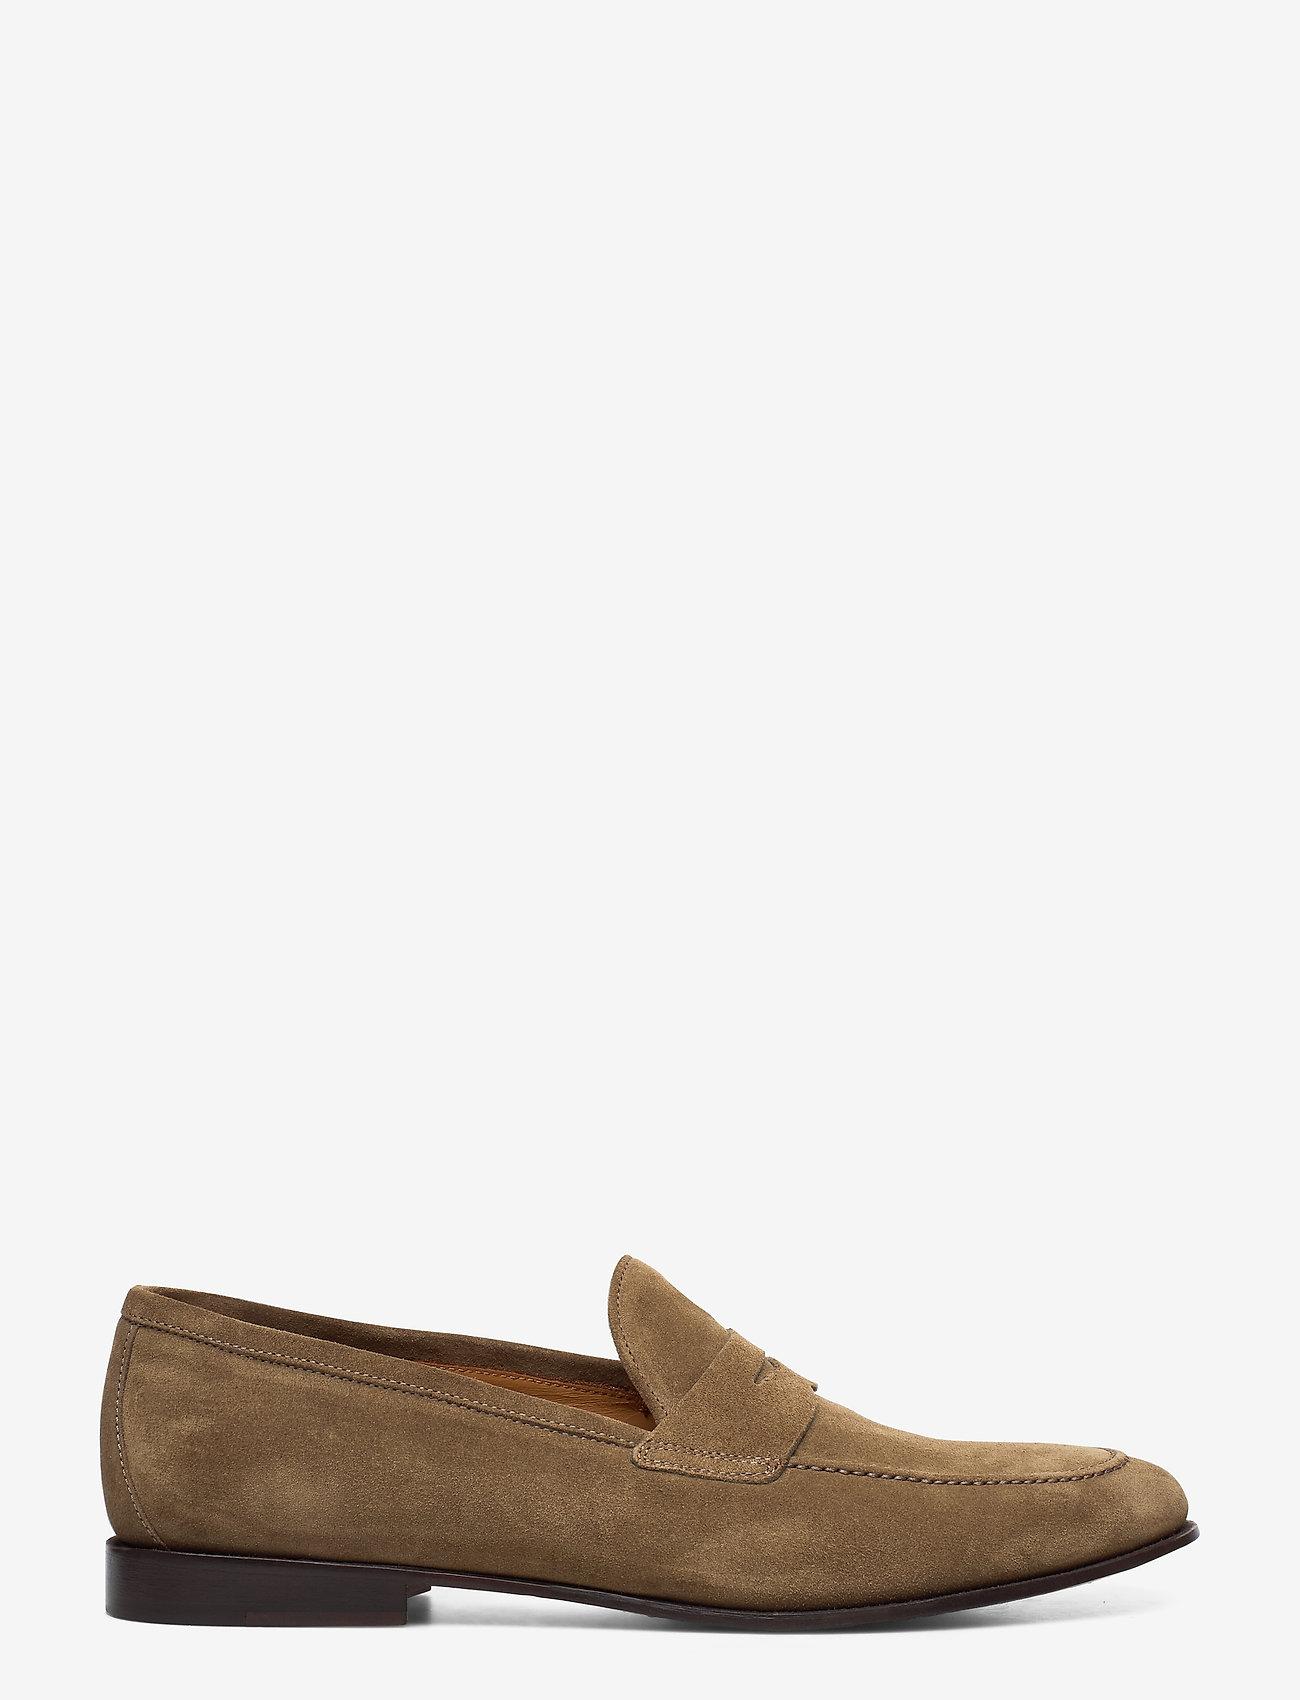 SAND - Footwear MW - F359 - loafers - light camel - 1